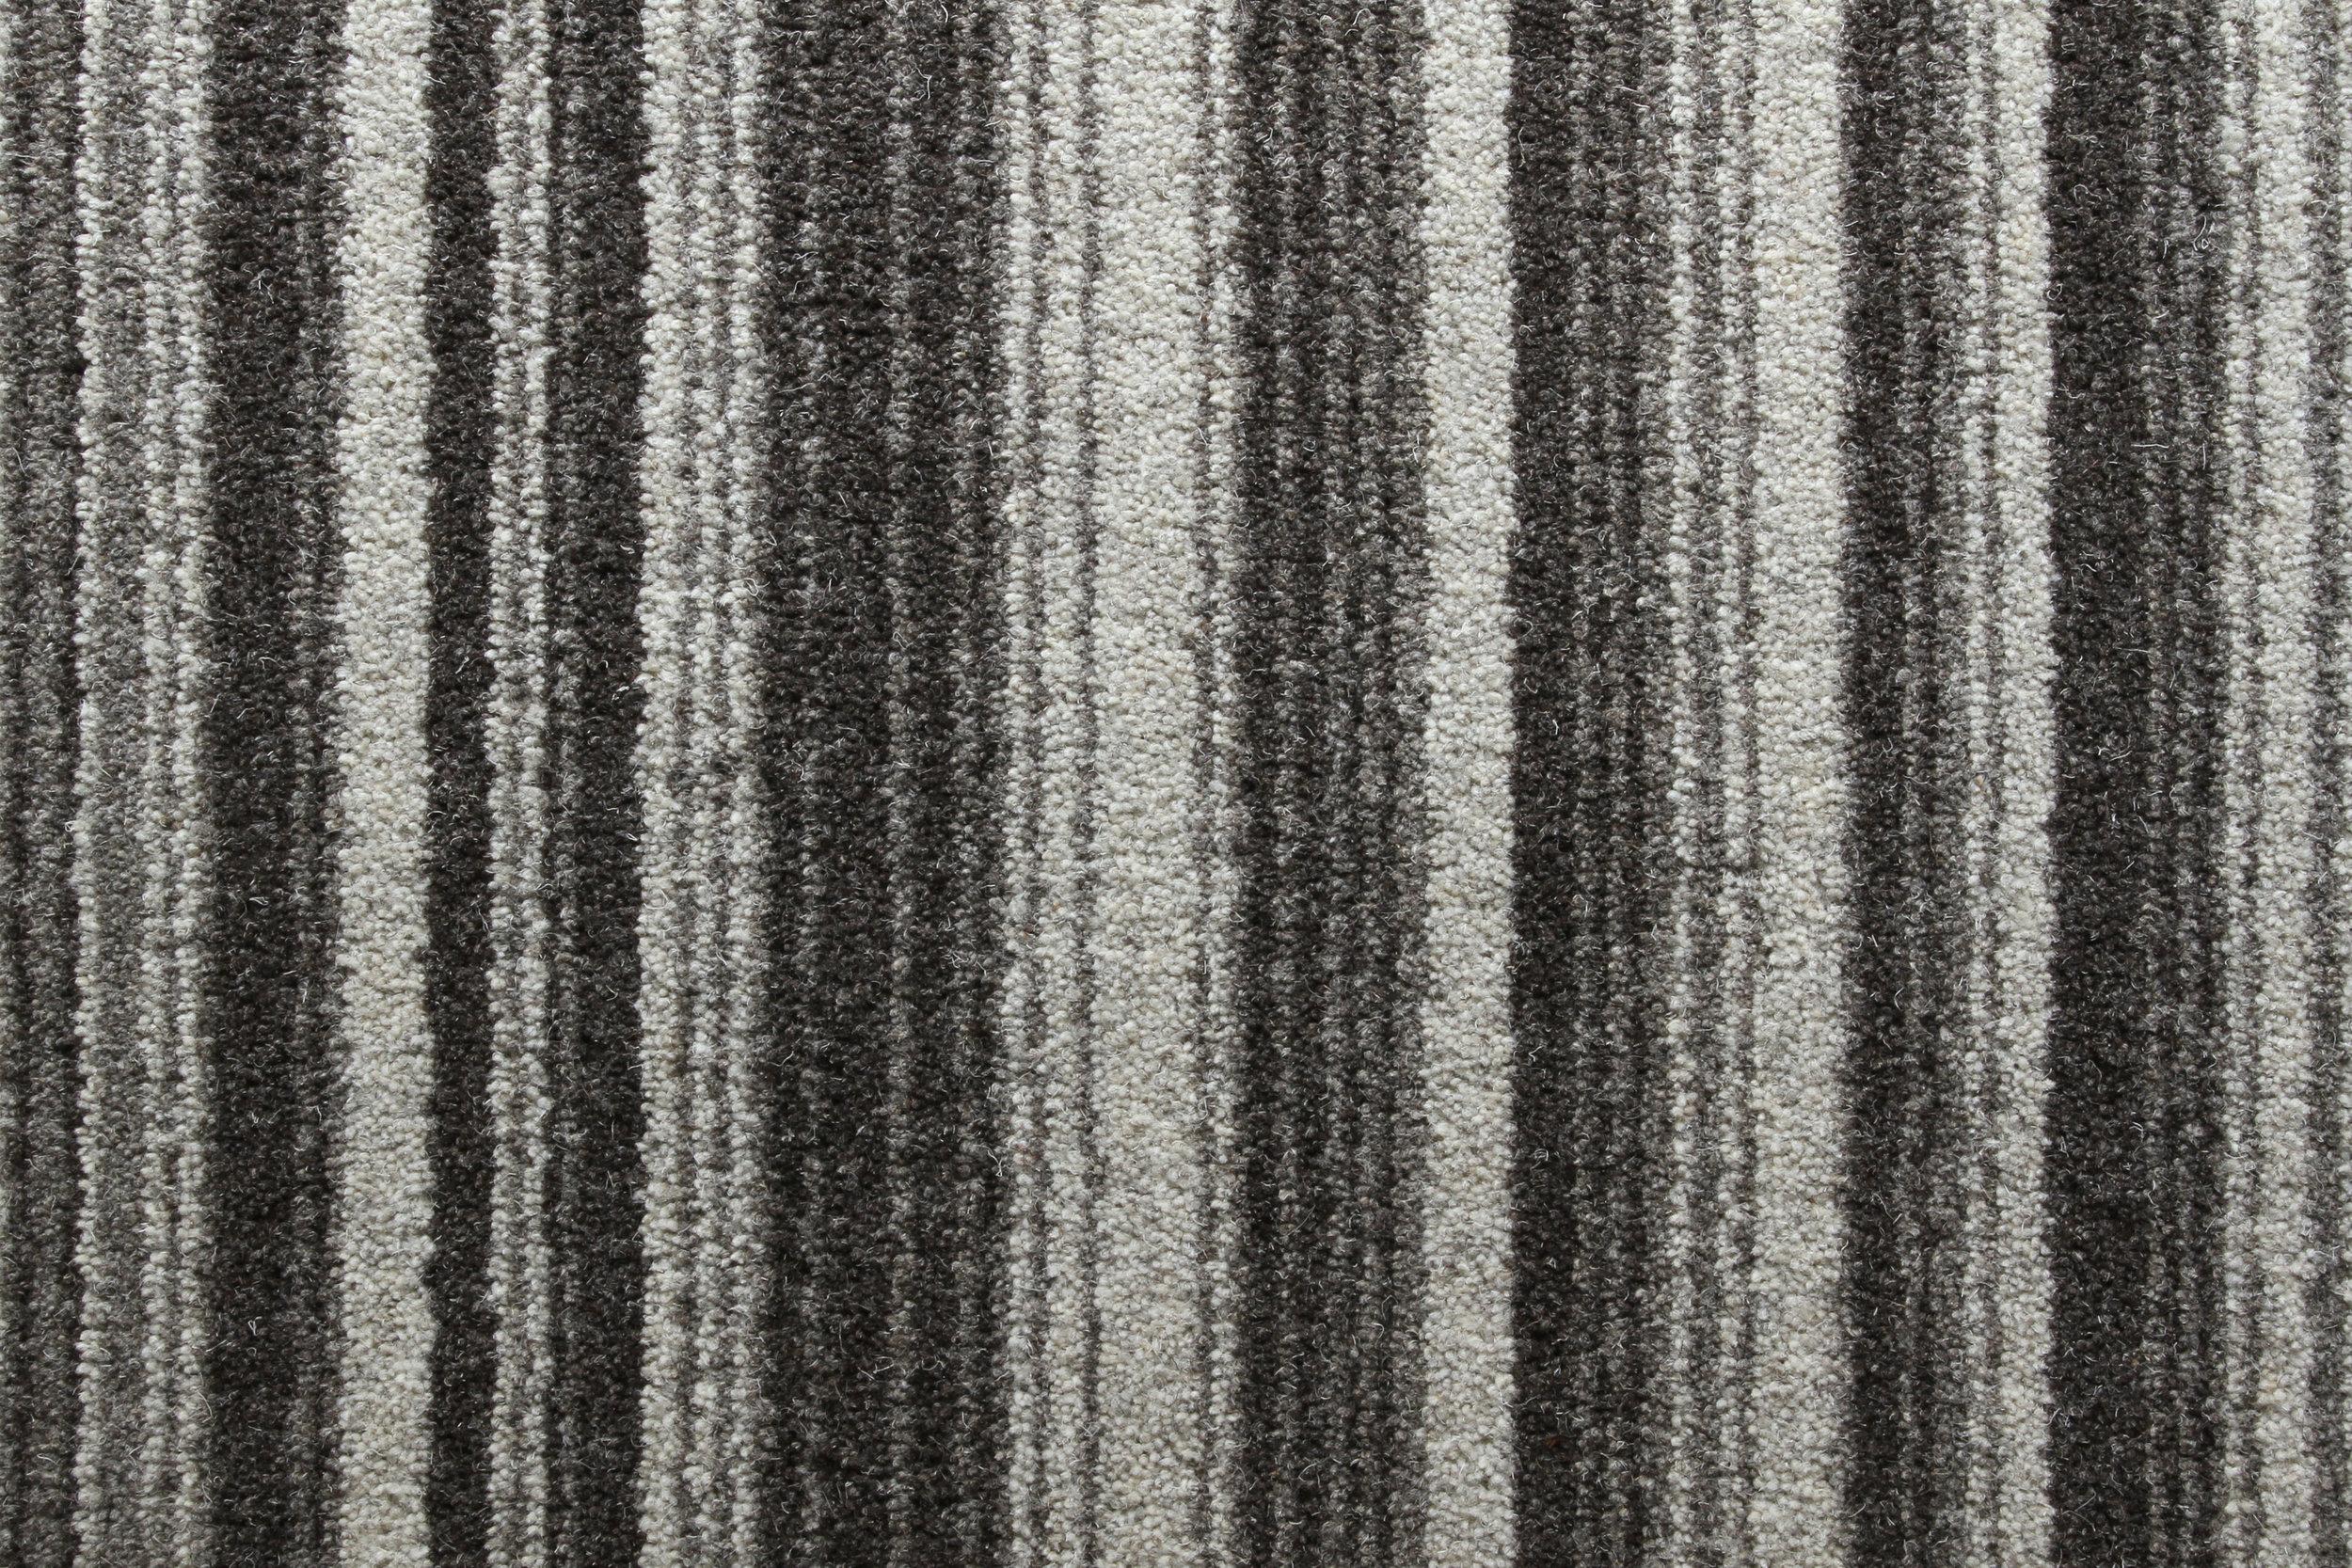 Designer graphite stripe - A striking contemporary design